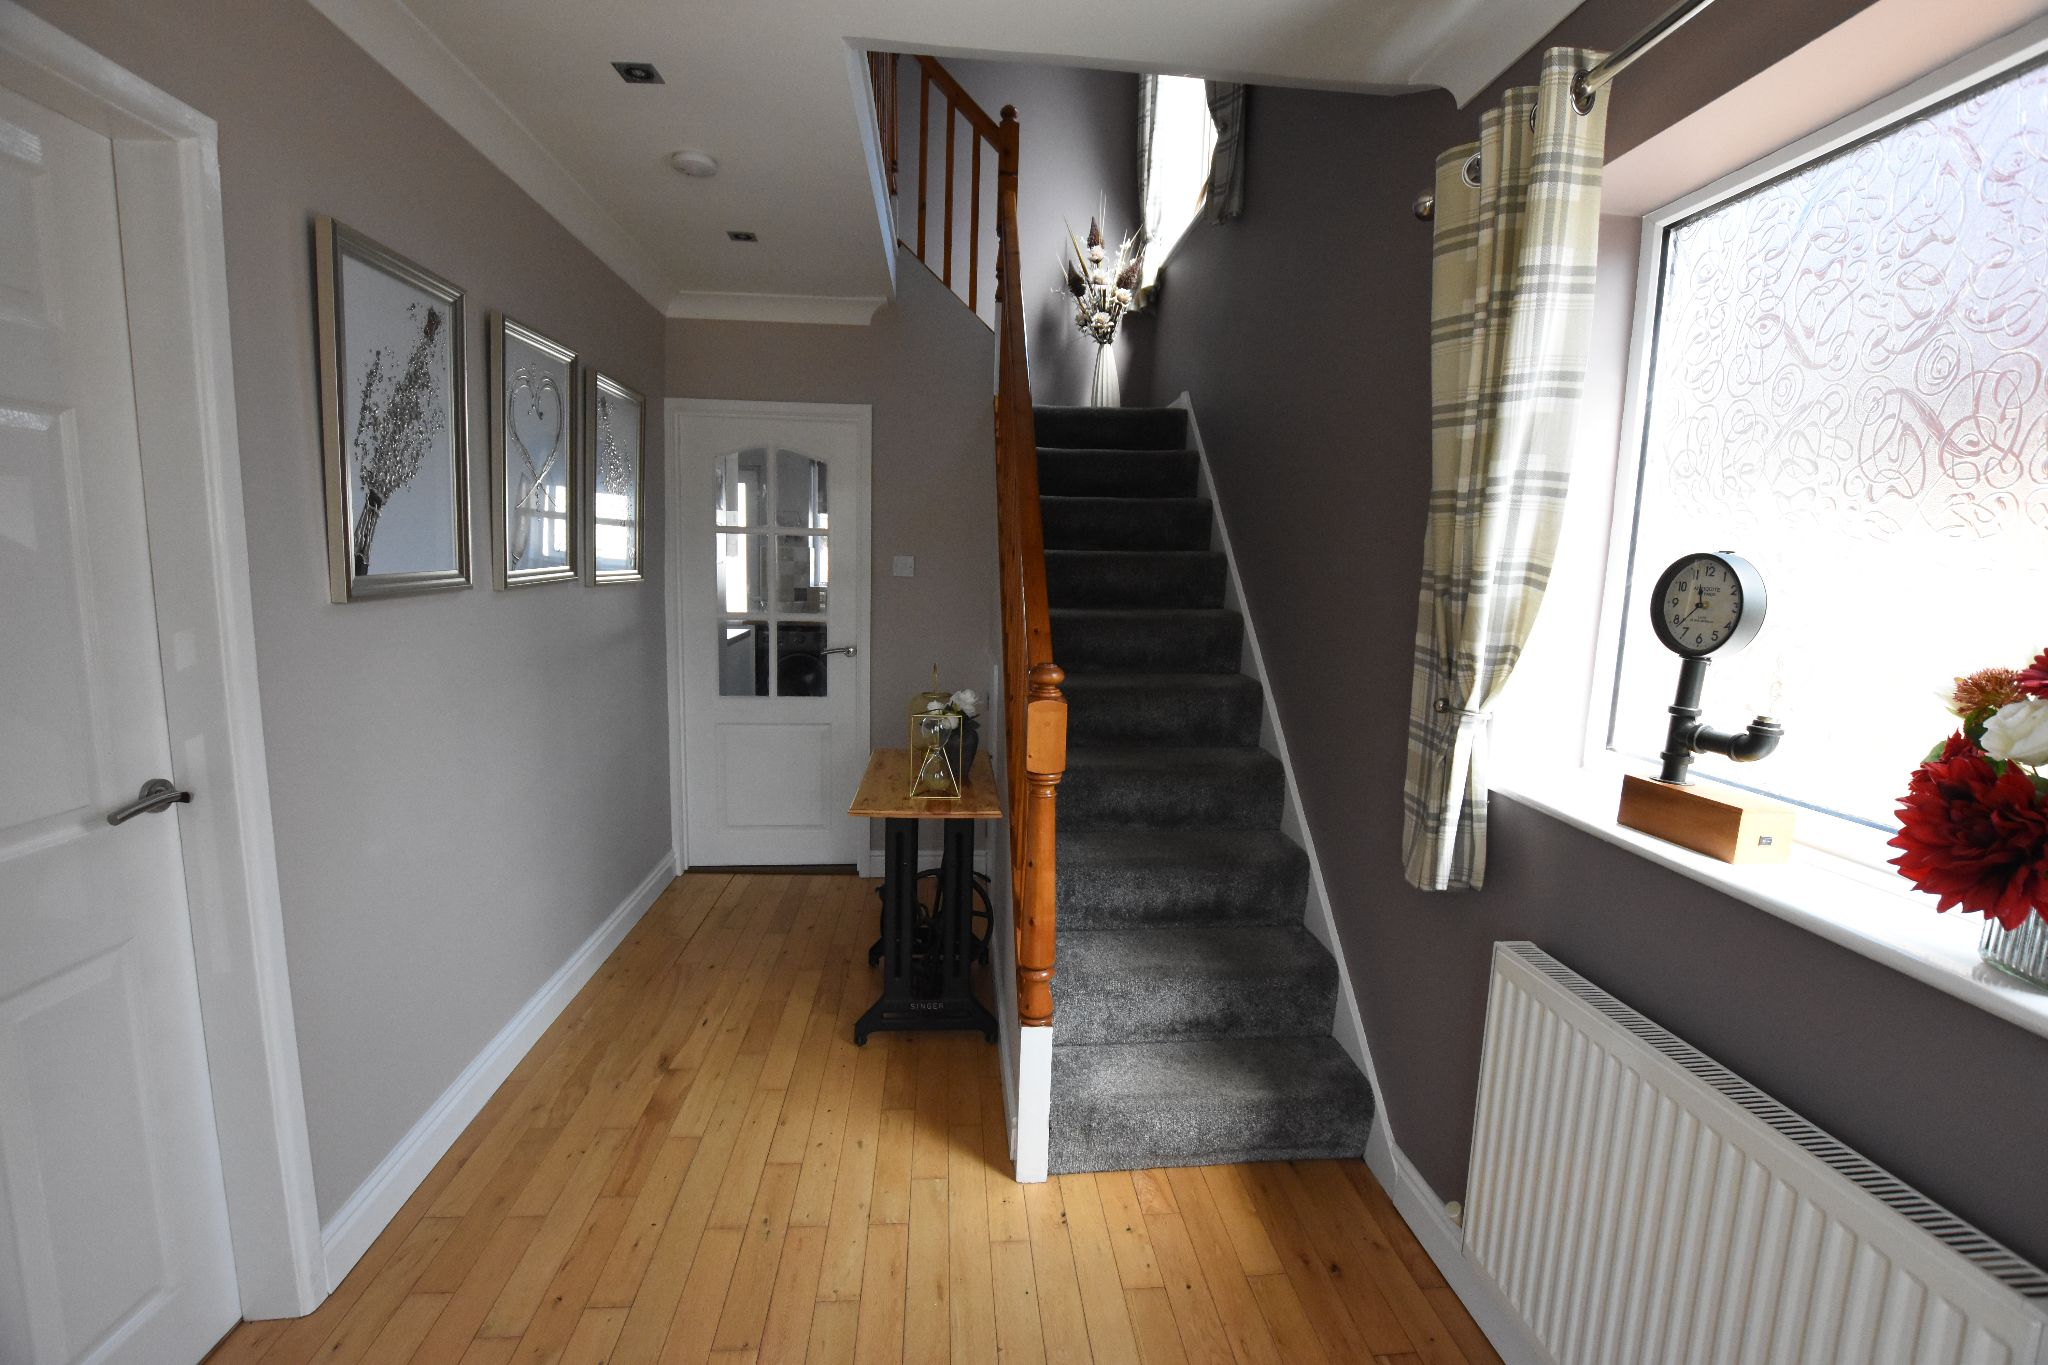 3 bedroom semi-detached house Sold STC in Preston - Hallway